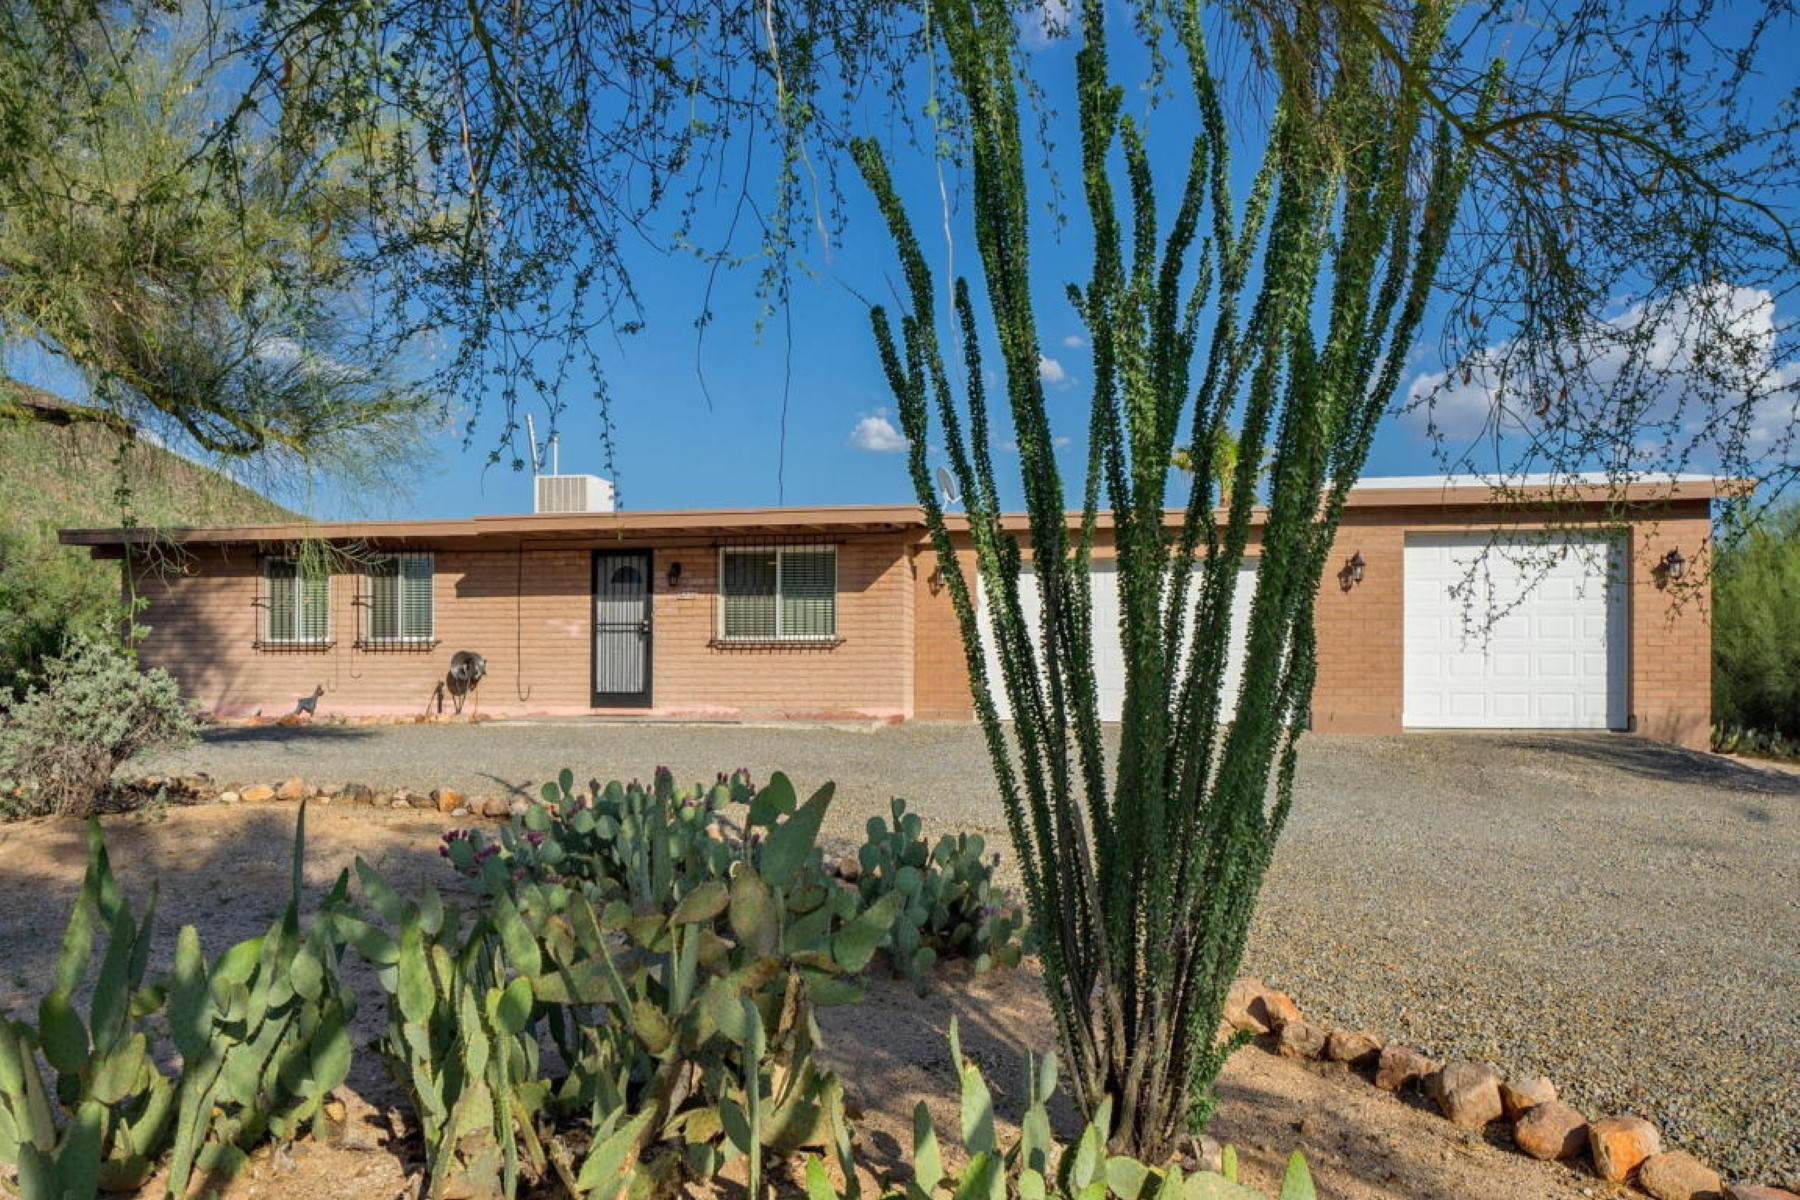 Villa per Vendita alle ore Majestic Pusch Ridge mountain views from this lovely home 8532 N Rancho Catalina Drive Tucson, Arizona, 85704 Stati Uniti